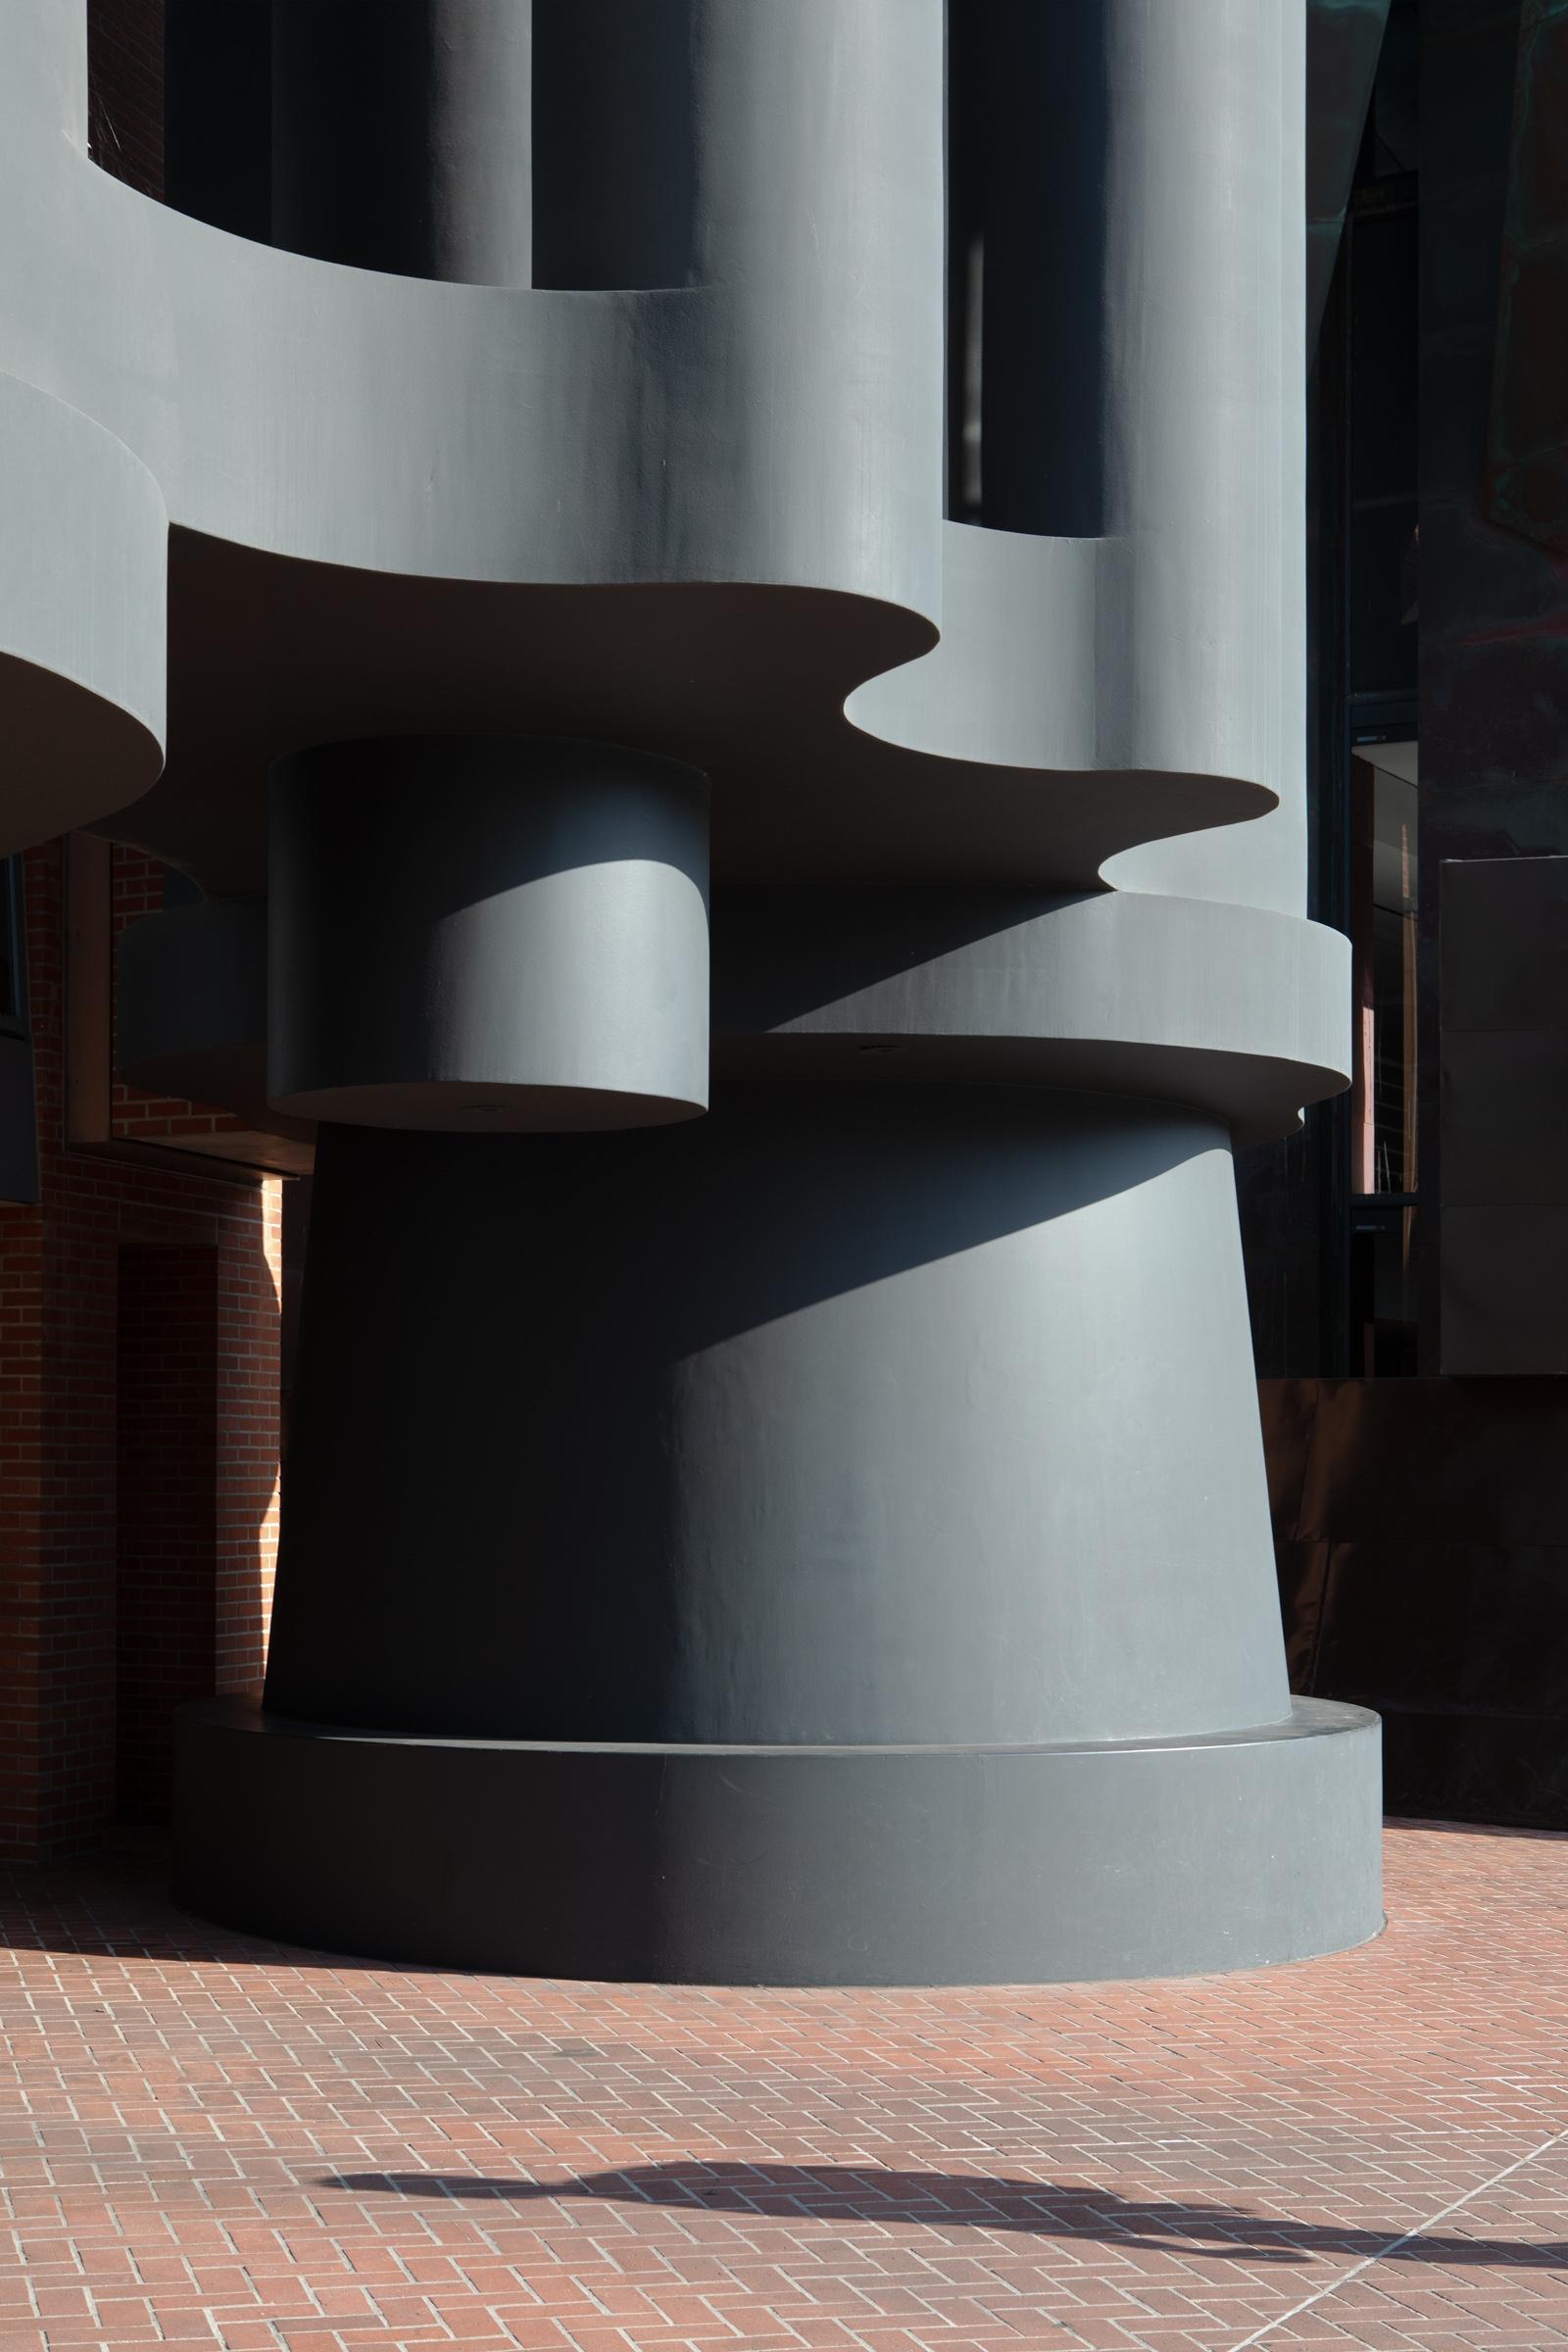 Binoculars, Chiat/Day Building - odouglas | ello